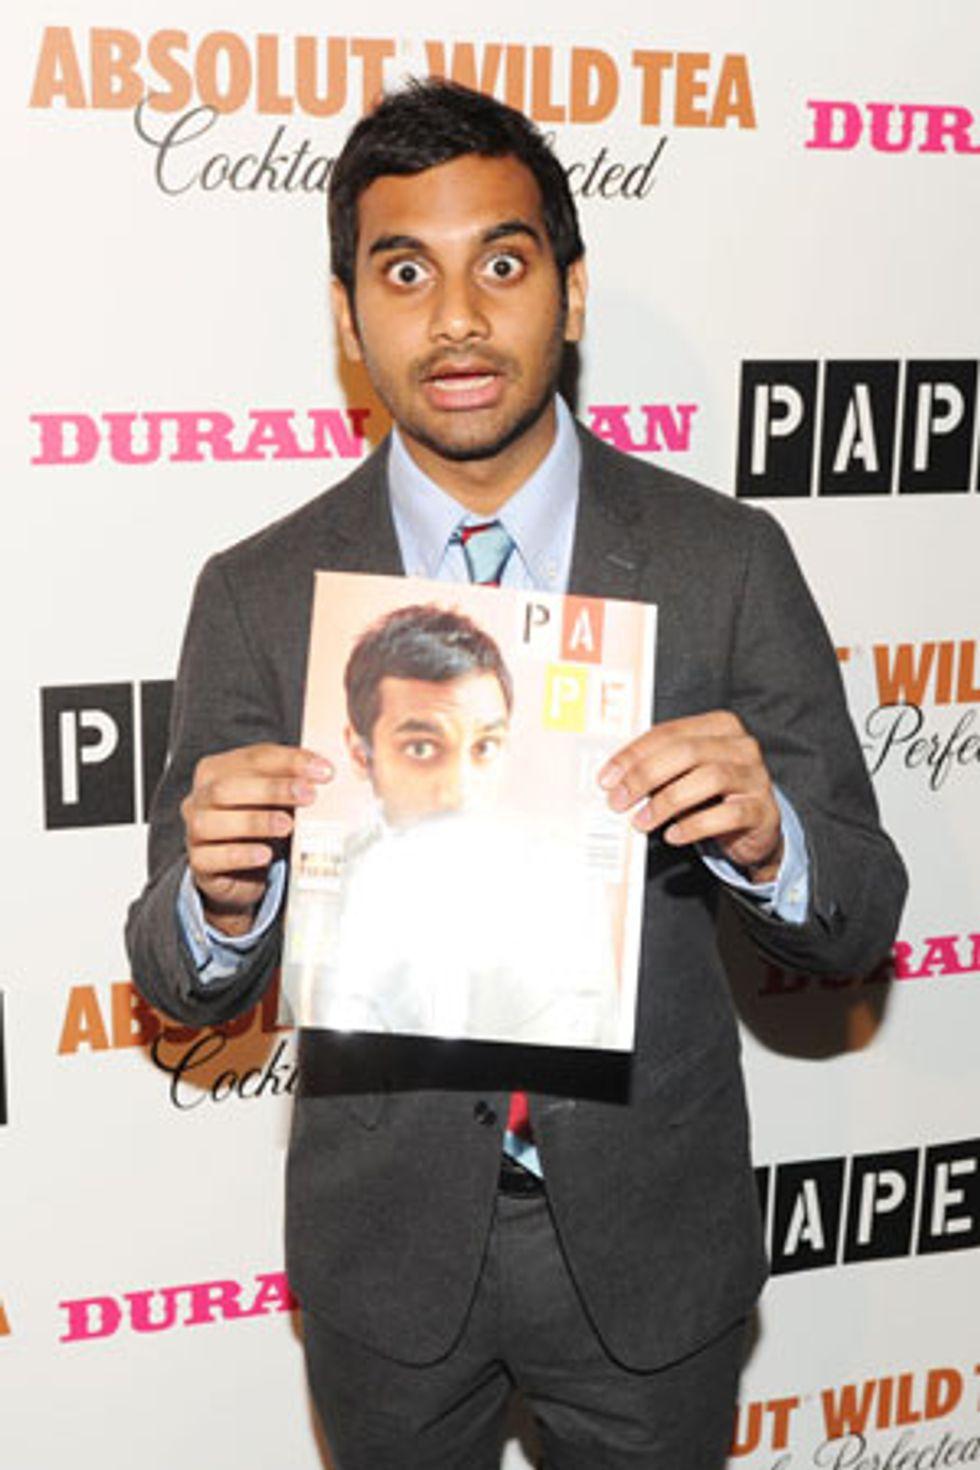 Paper's Beautiful People Party With Duran Duran and Aziz Ansari at Good Units